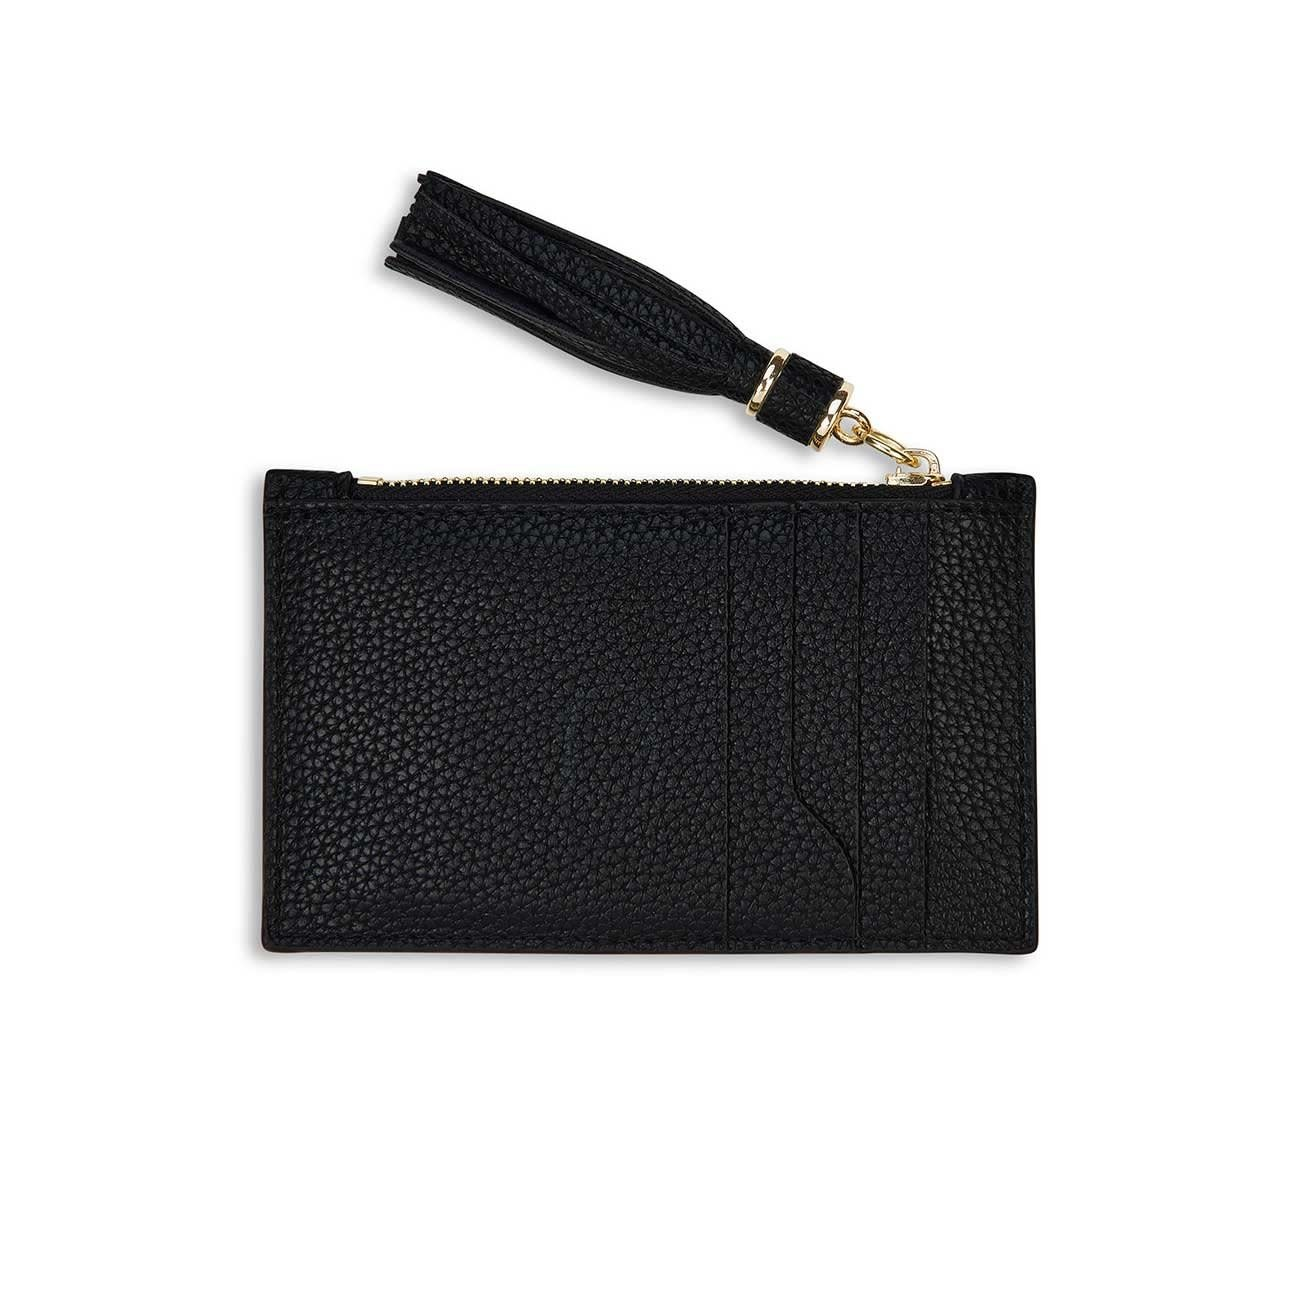 Katie Loxton Sophia tassel card holder black - 8.5 x 13.5 cm